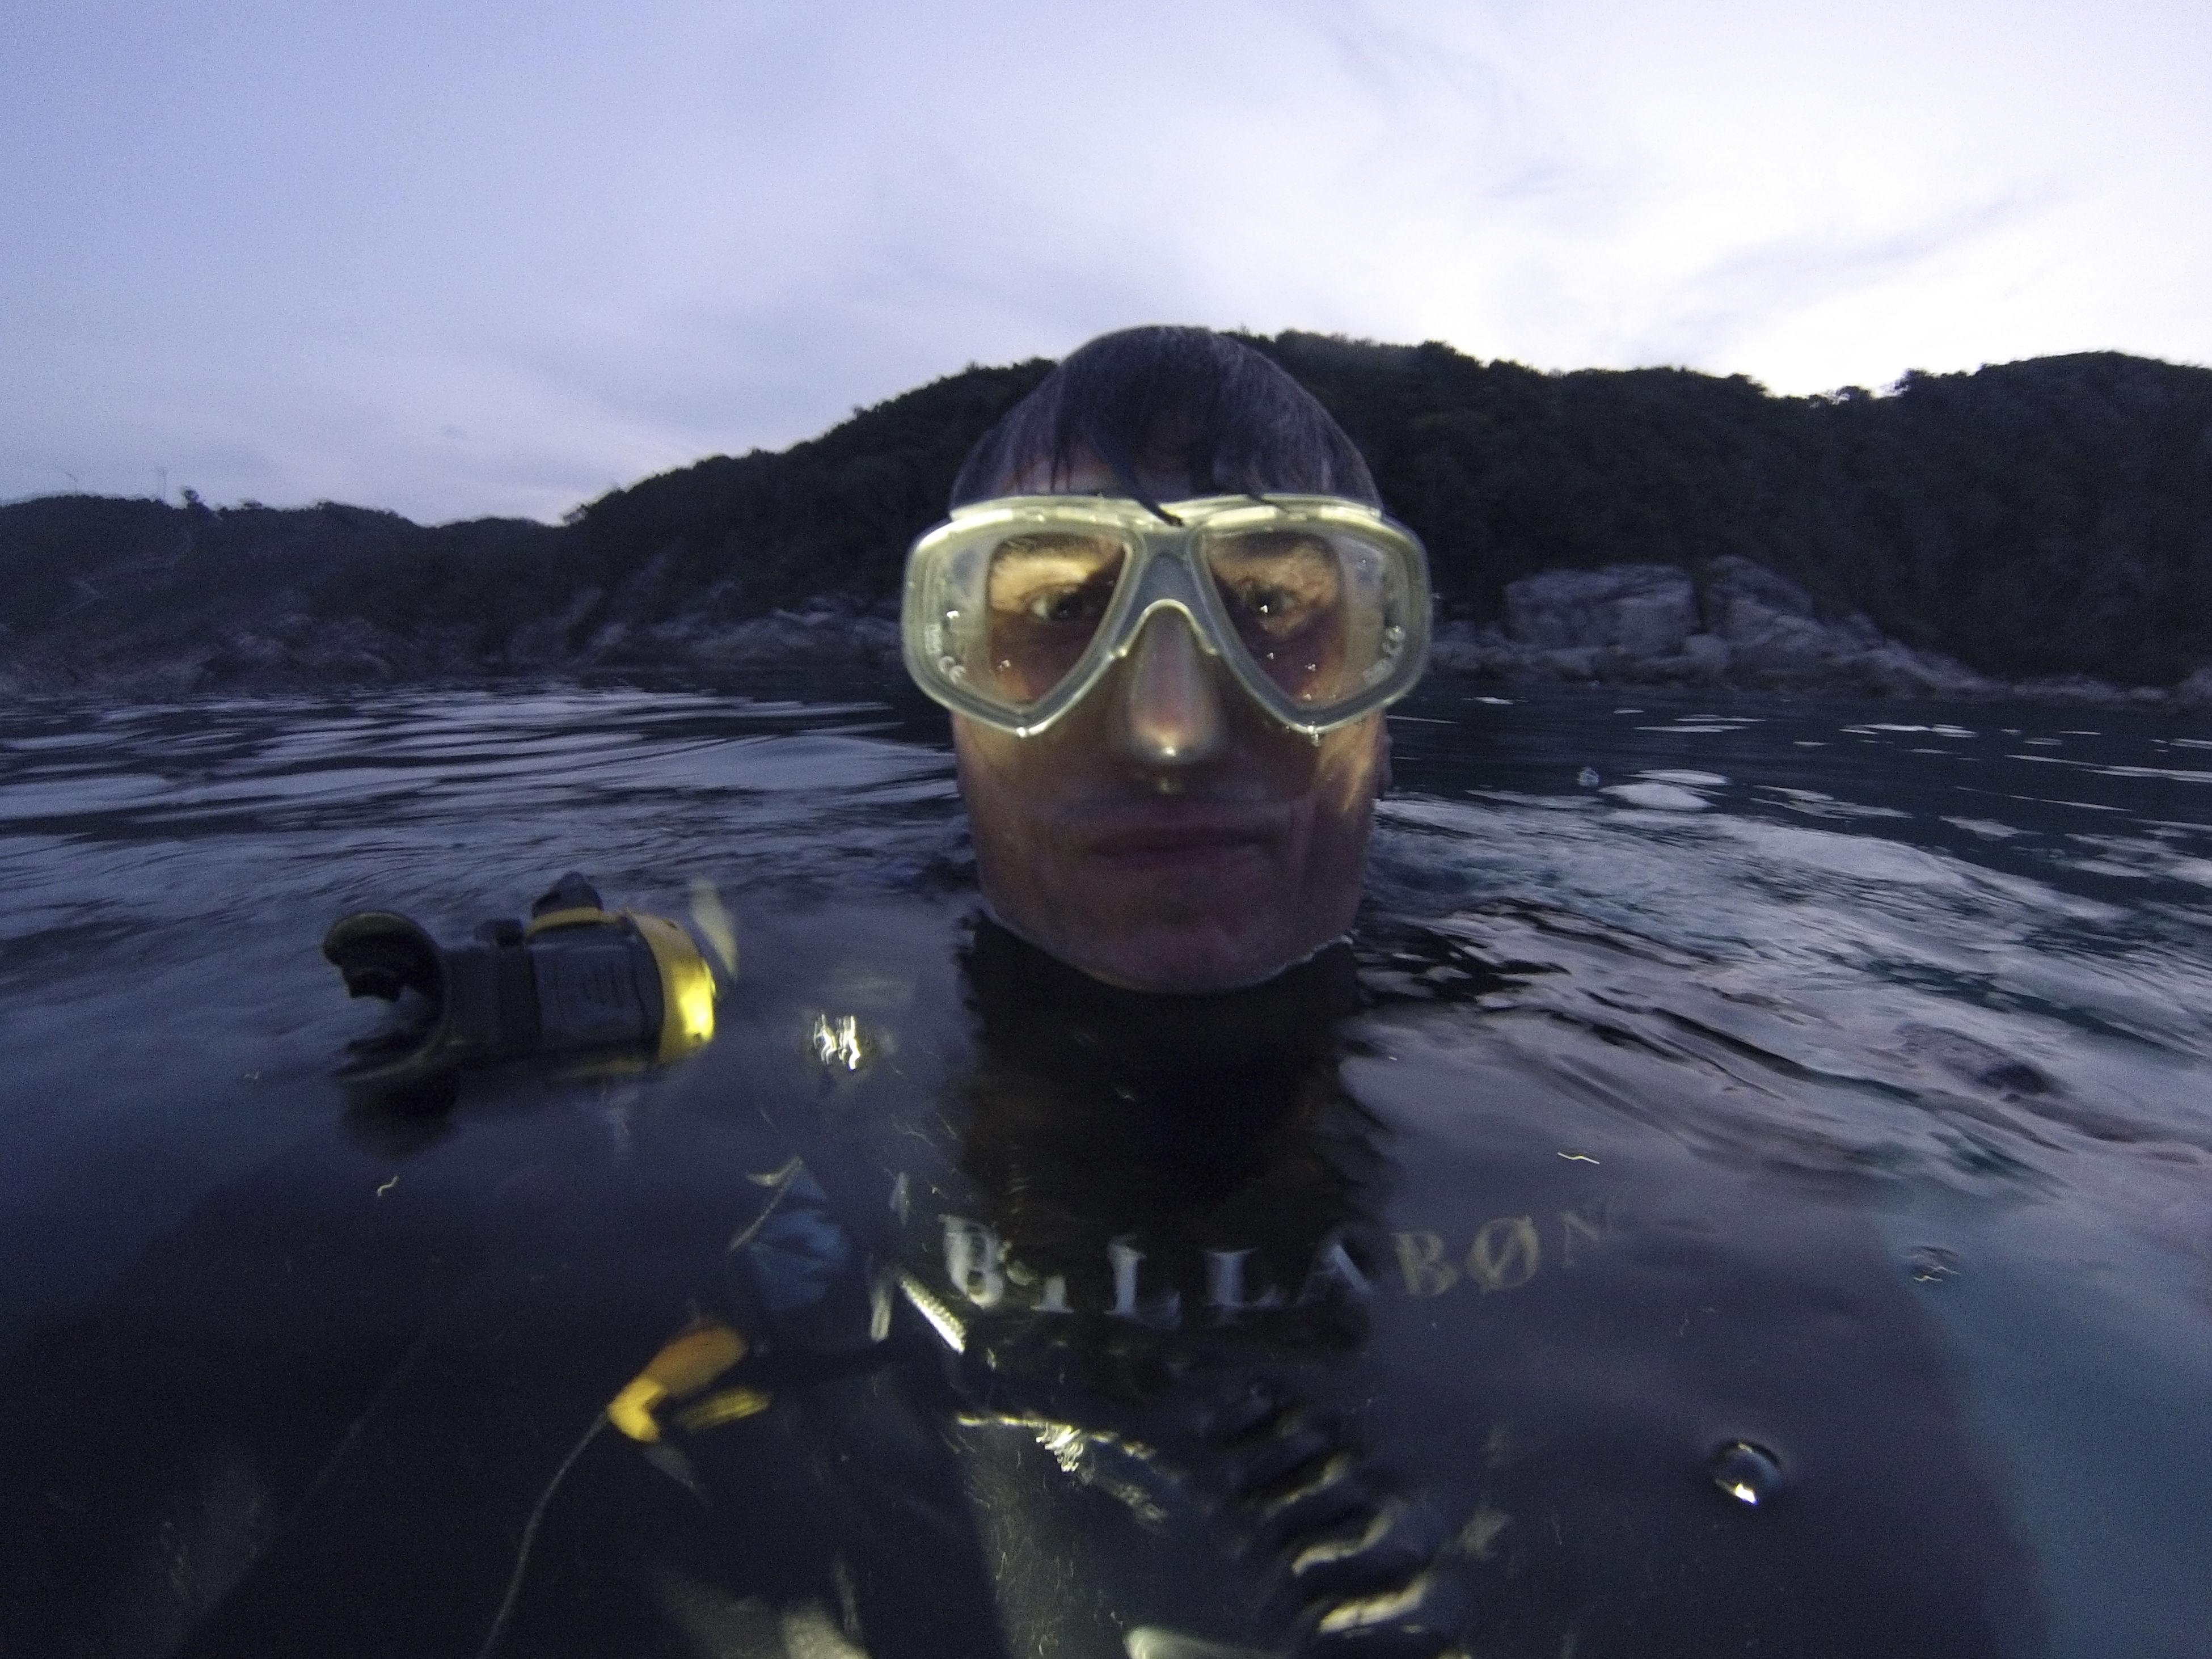 Strange Creatures of the Sea - D'lagoon @ pulau perhentian